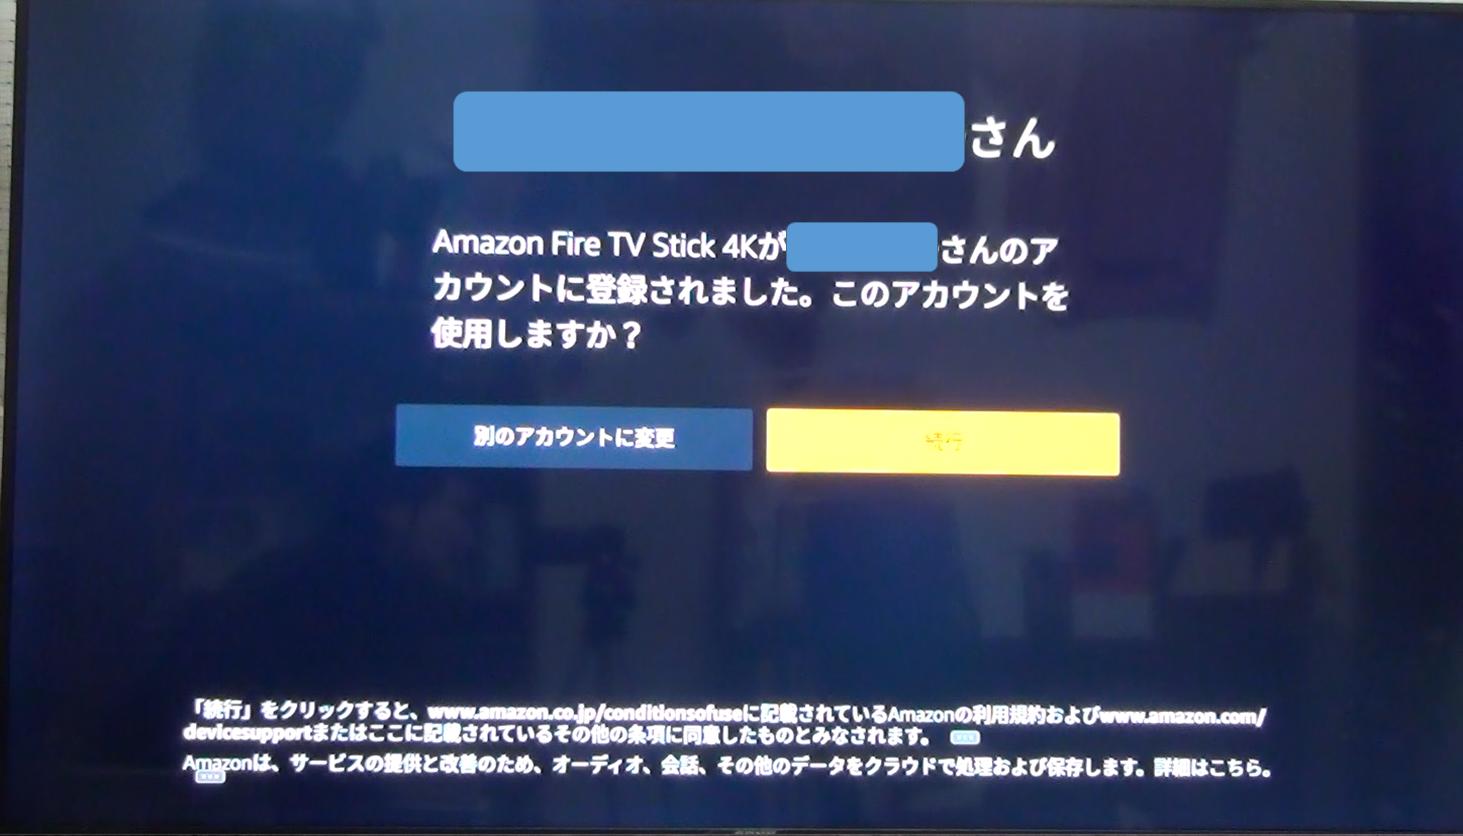 fire tv stick 4k アマゾンアカウントに登録